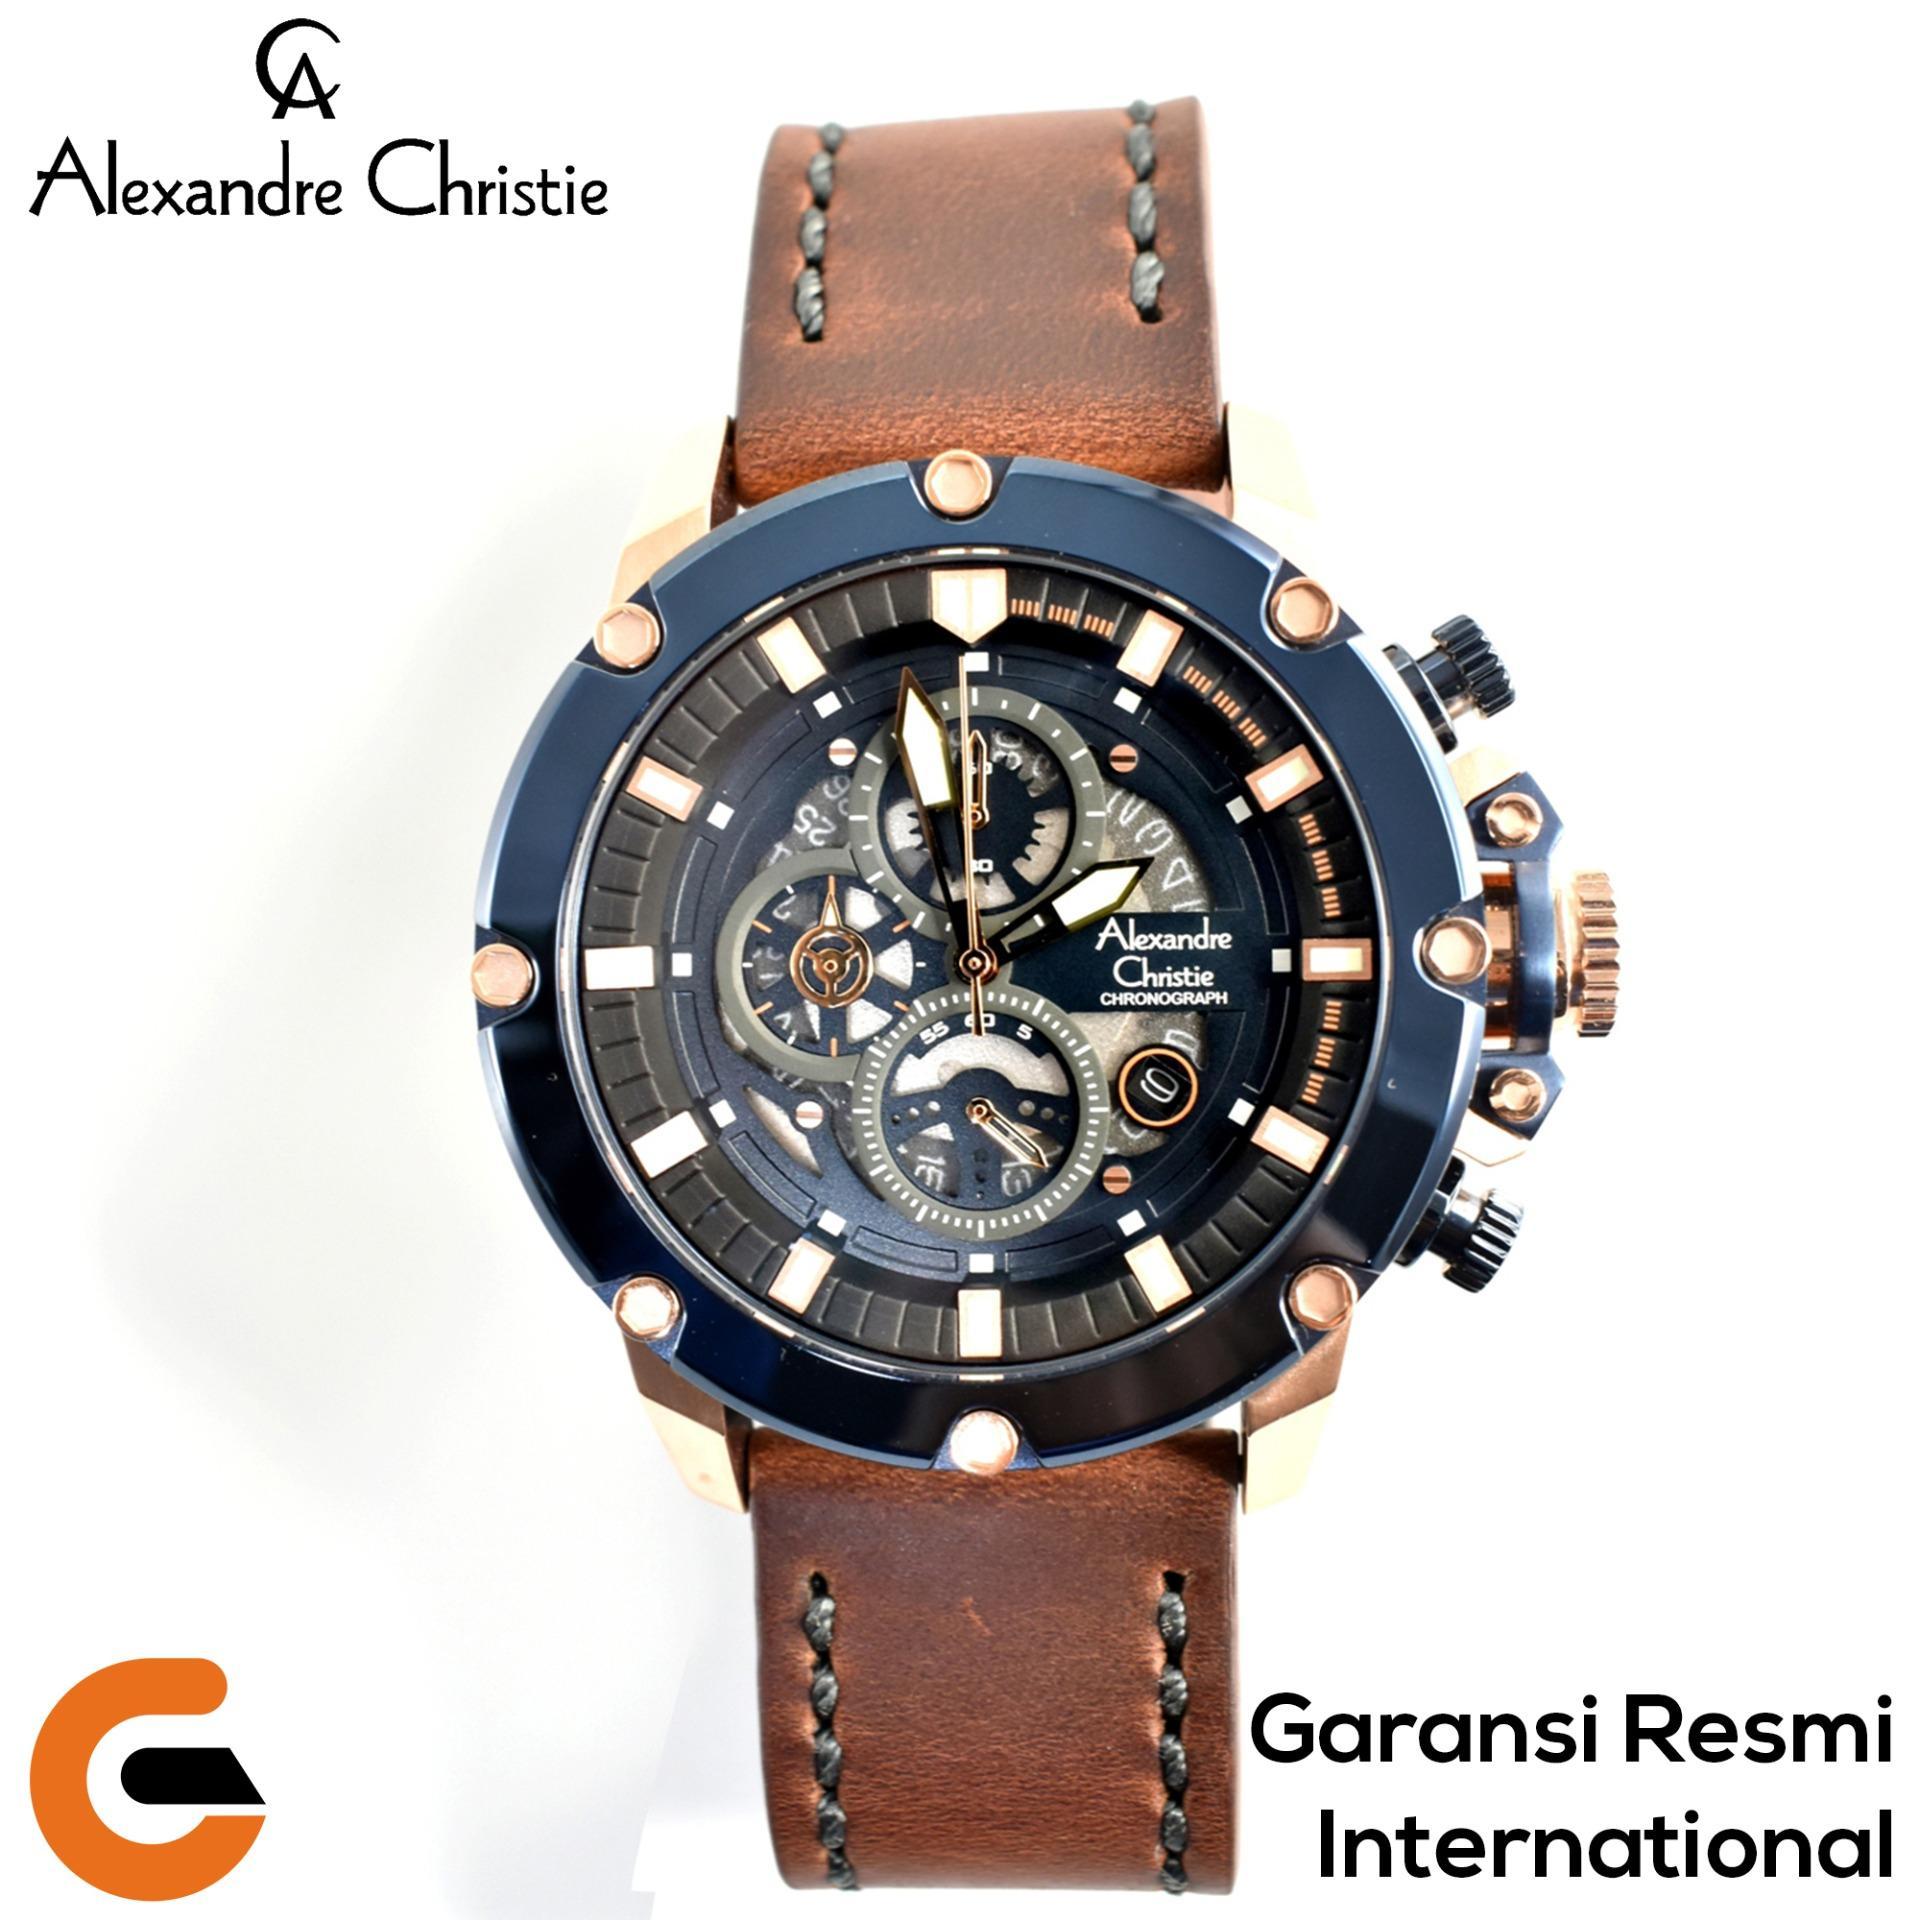 Alexandre Christie Chronograph Jam Tangan Pria AC 6416 Tali Kulit Leather   Jam  Tangan Alexander Christie 472ae6bf46